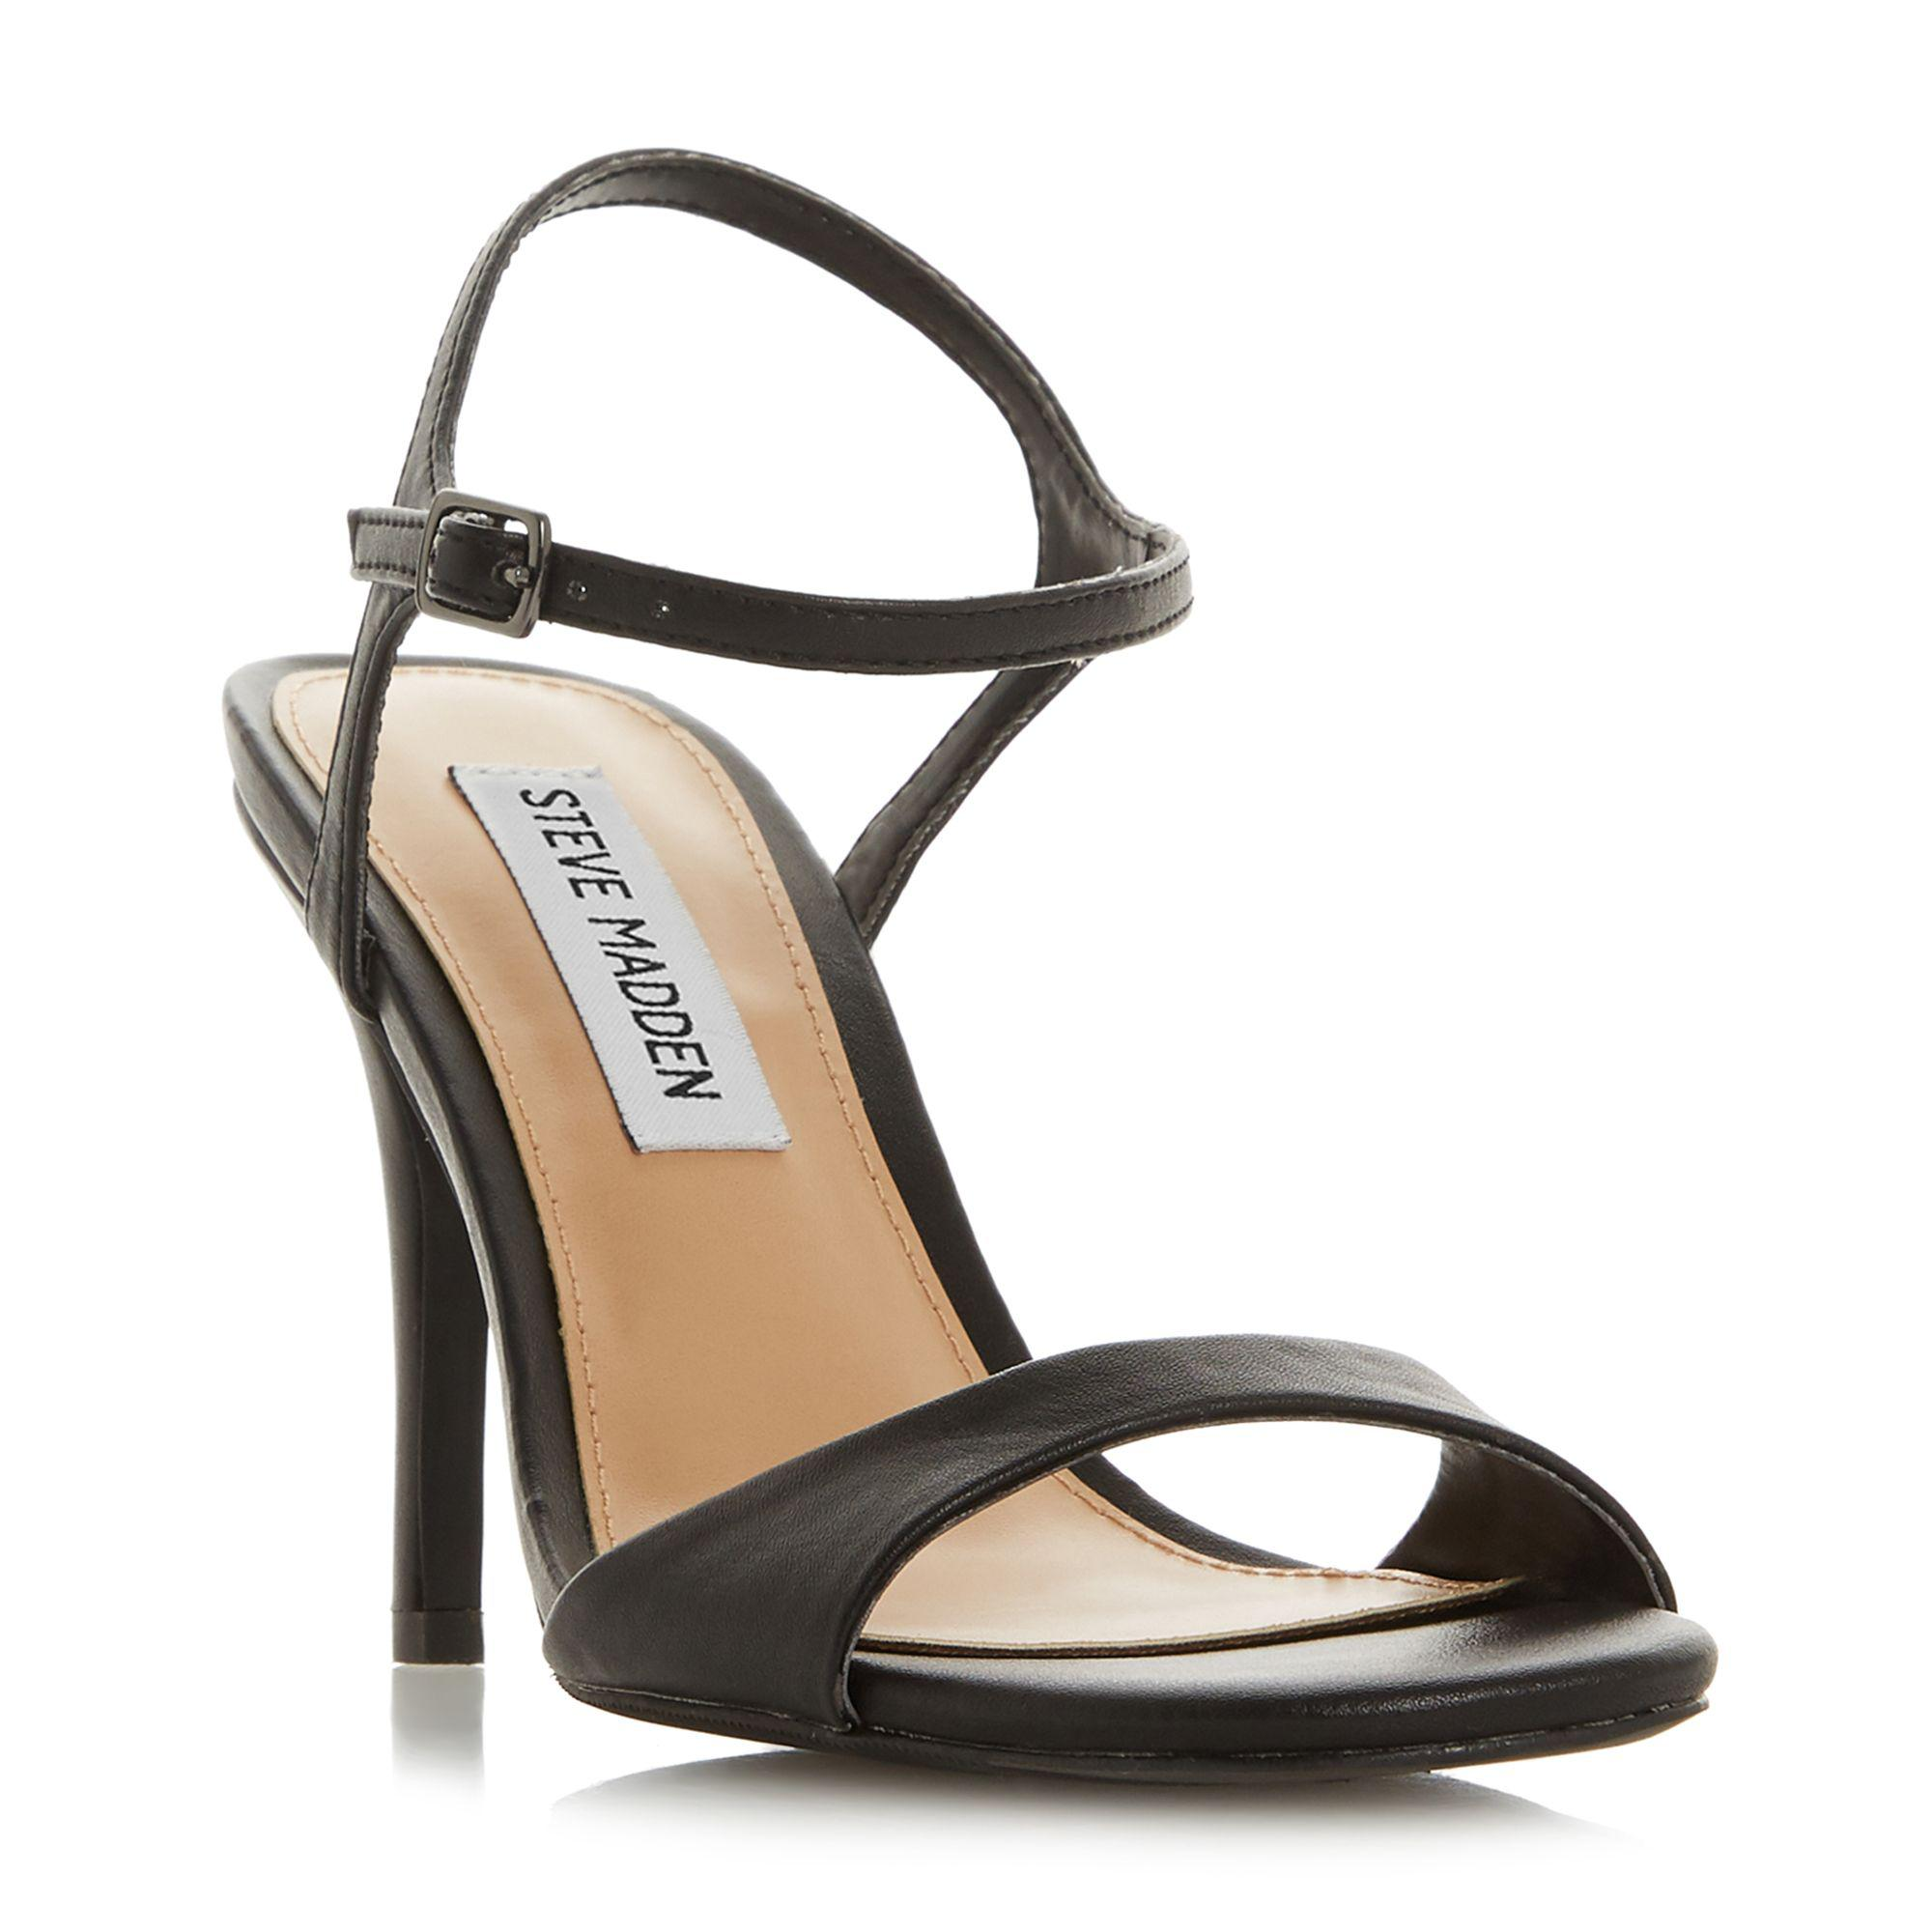 a07164178750 Steve Madden - Black Suede  faith High Stiletto Heel Ankle Strap Sandals -  Lyst. View fullscreen